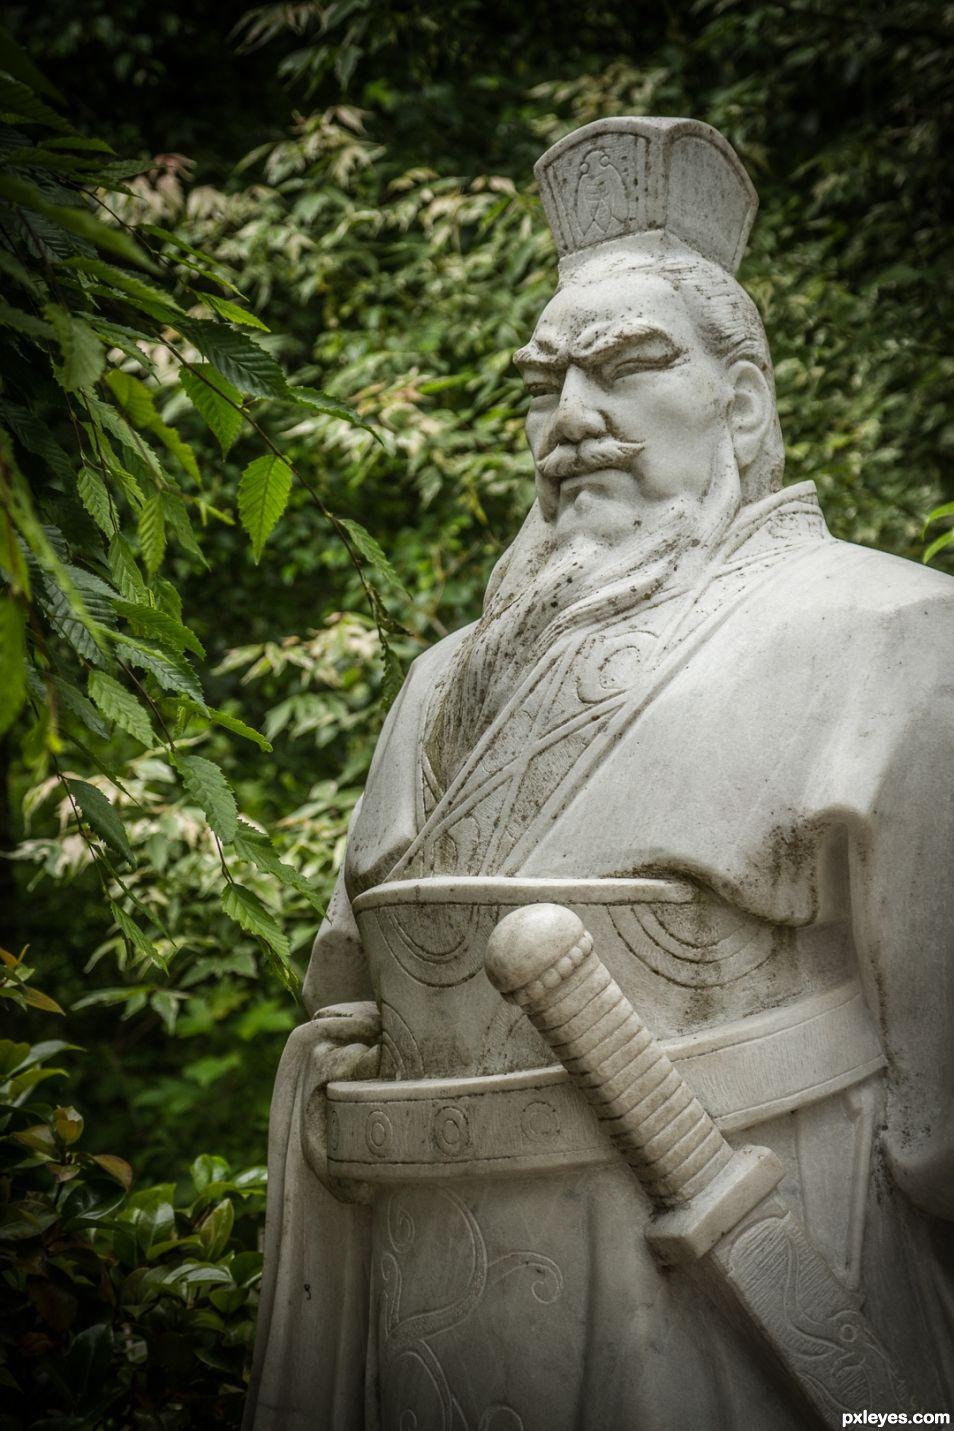 The old samurai